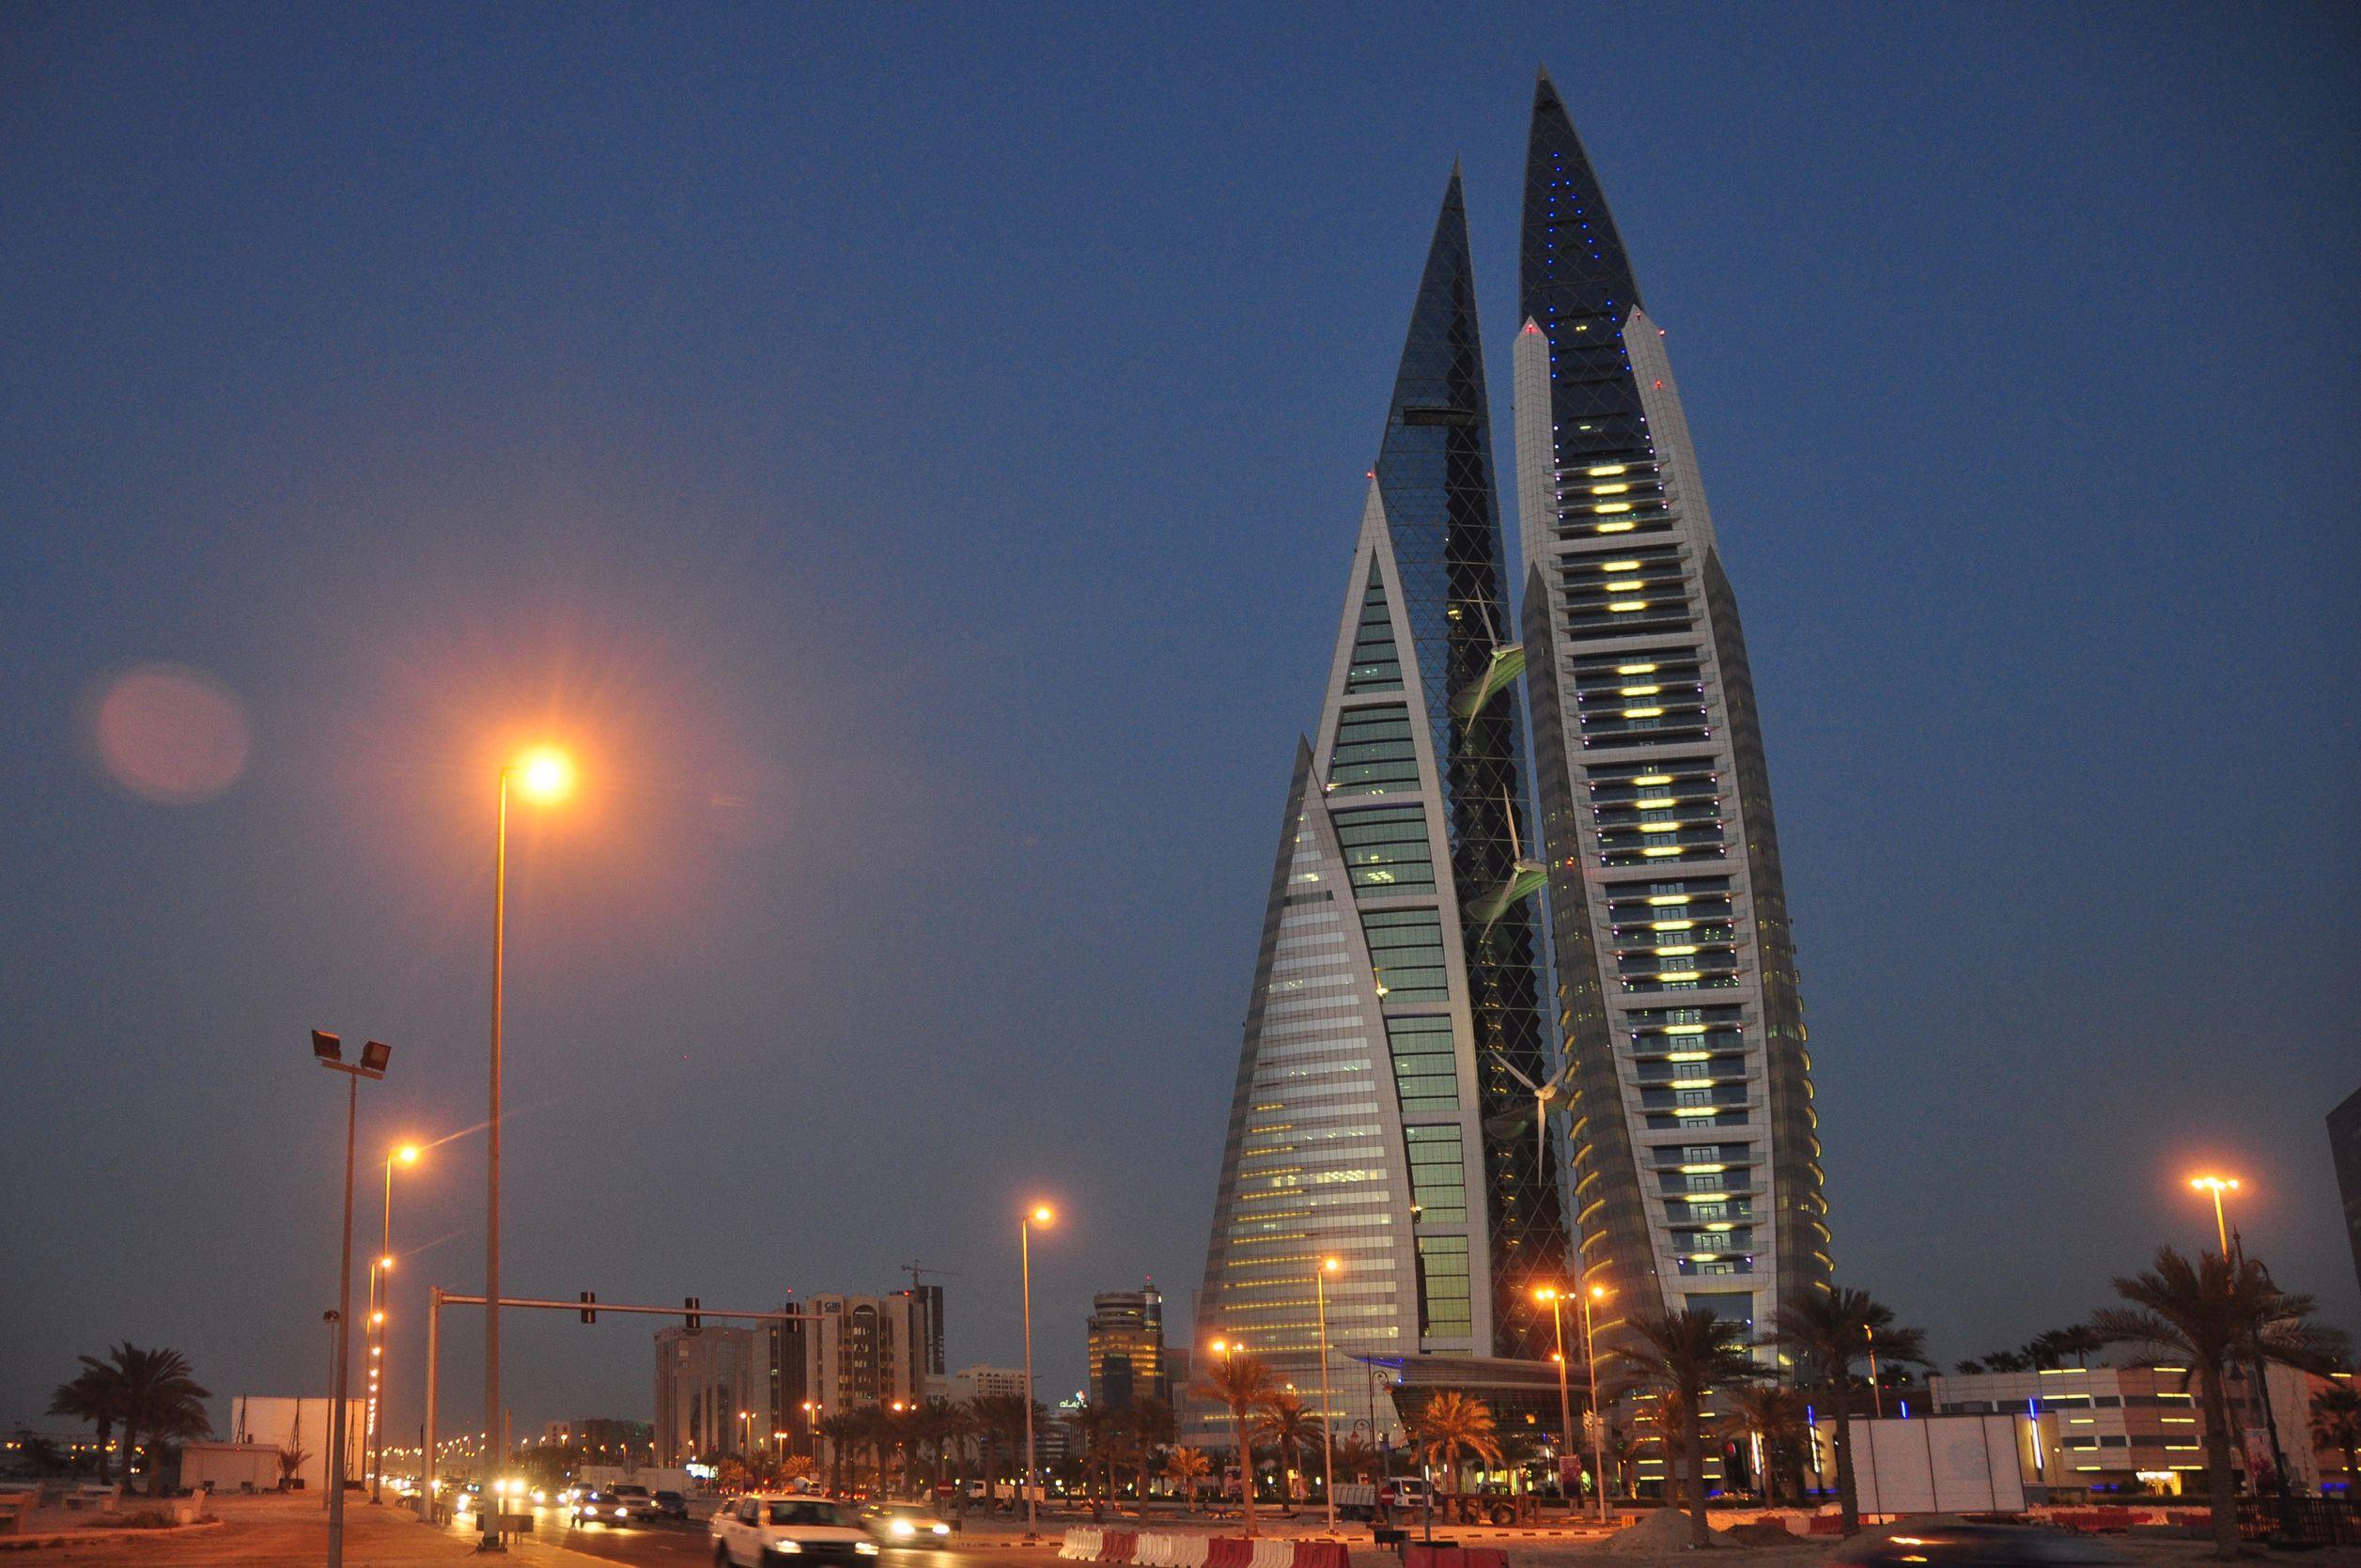 Hd Cute Panda Wallpaper Bahrain World Trade Center In Manama Thought Rot